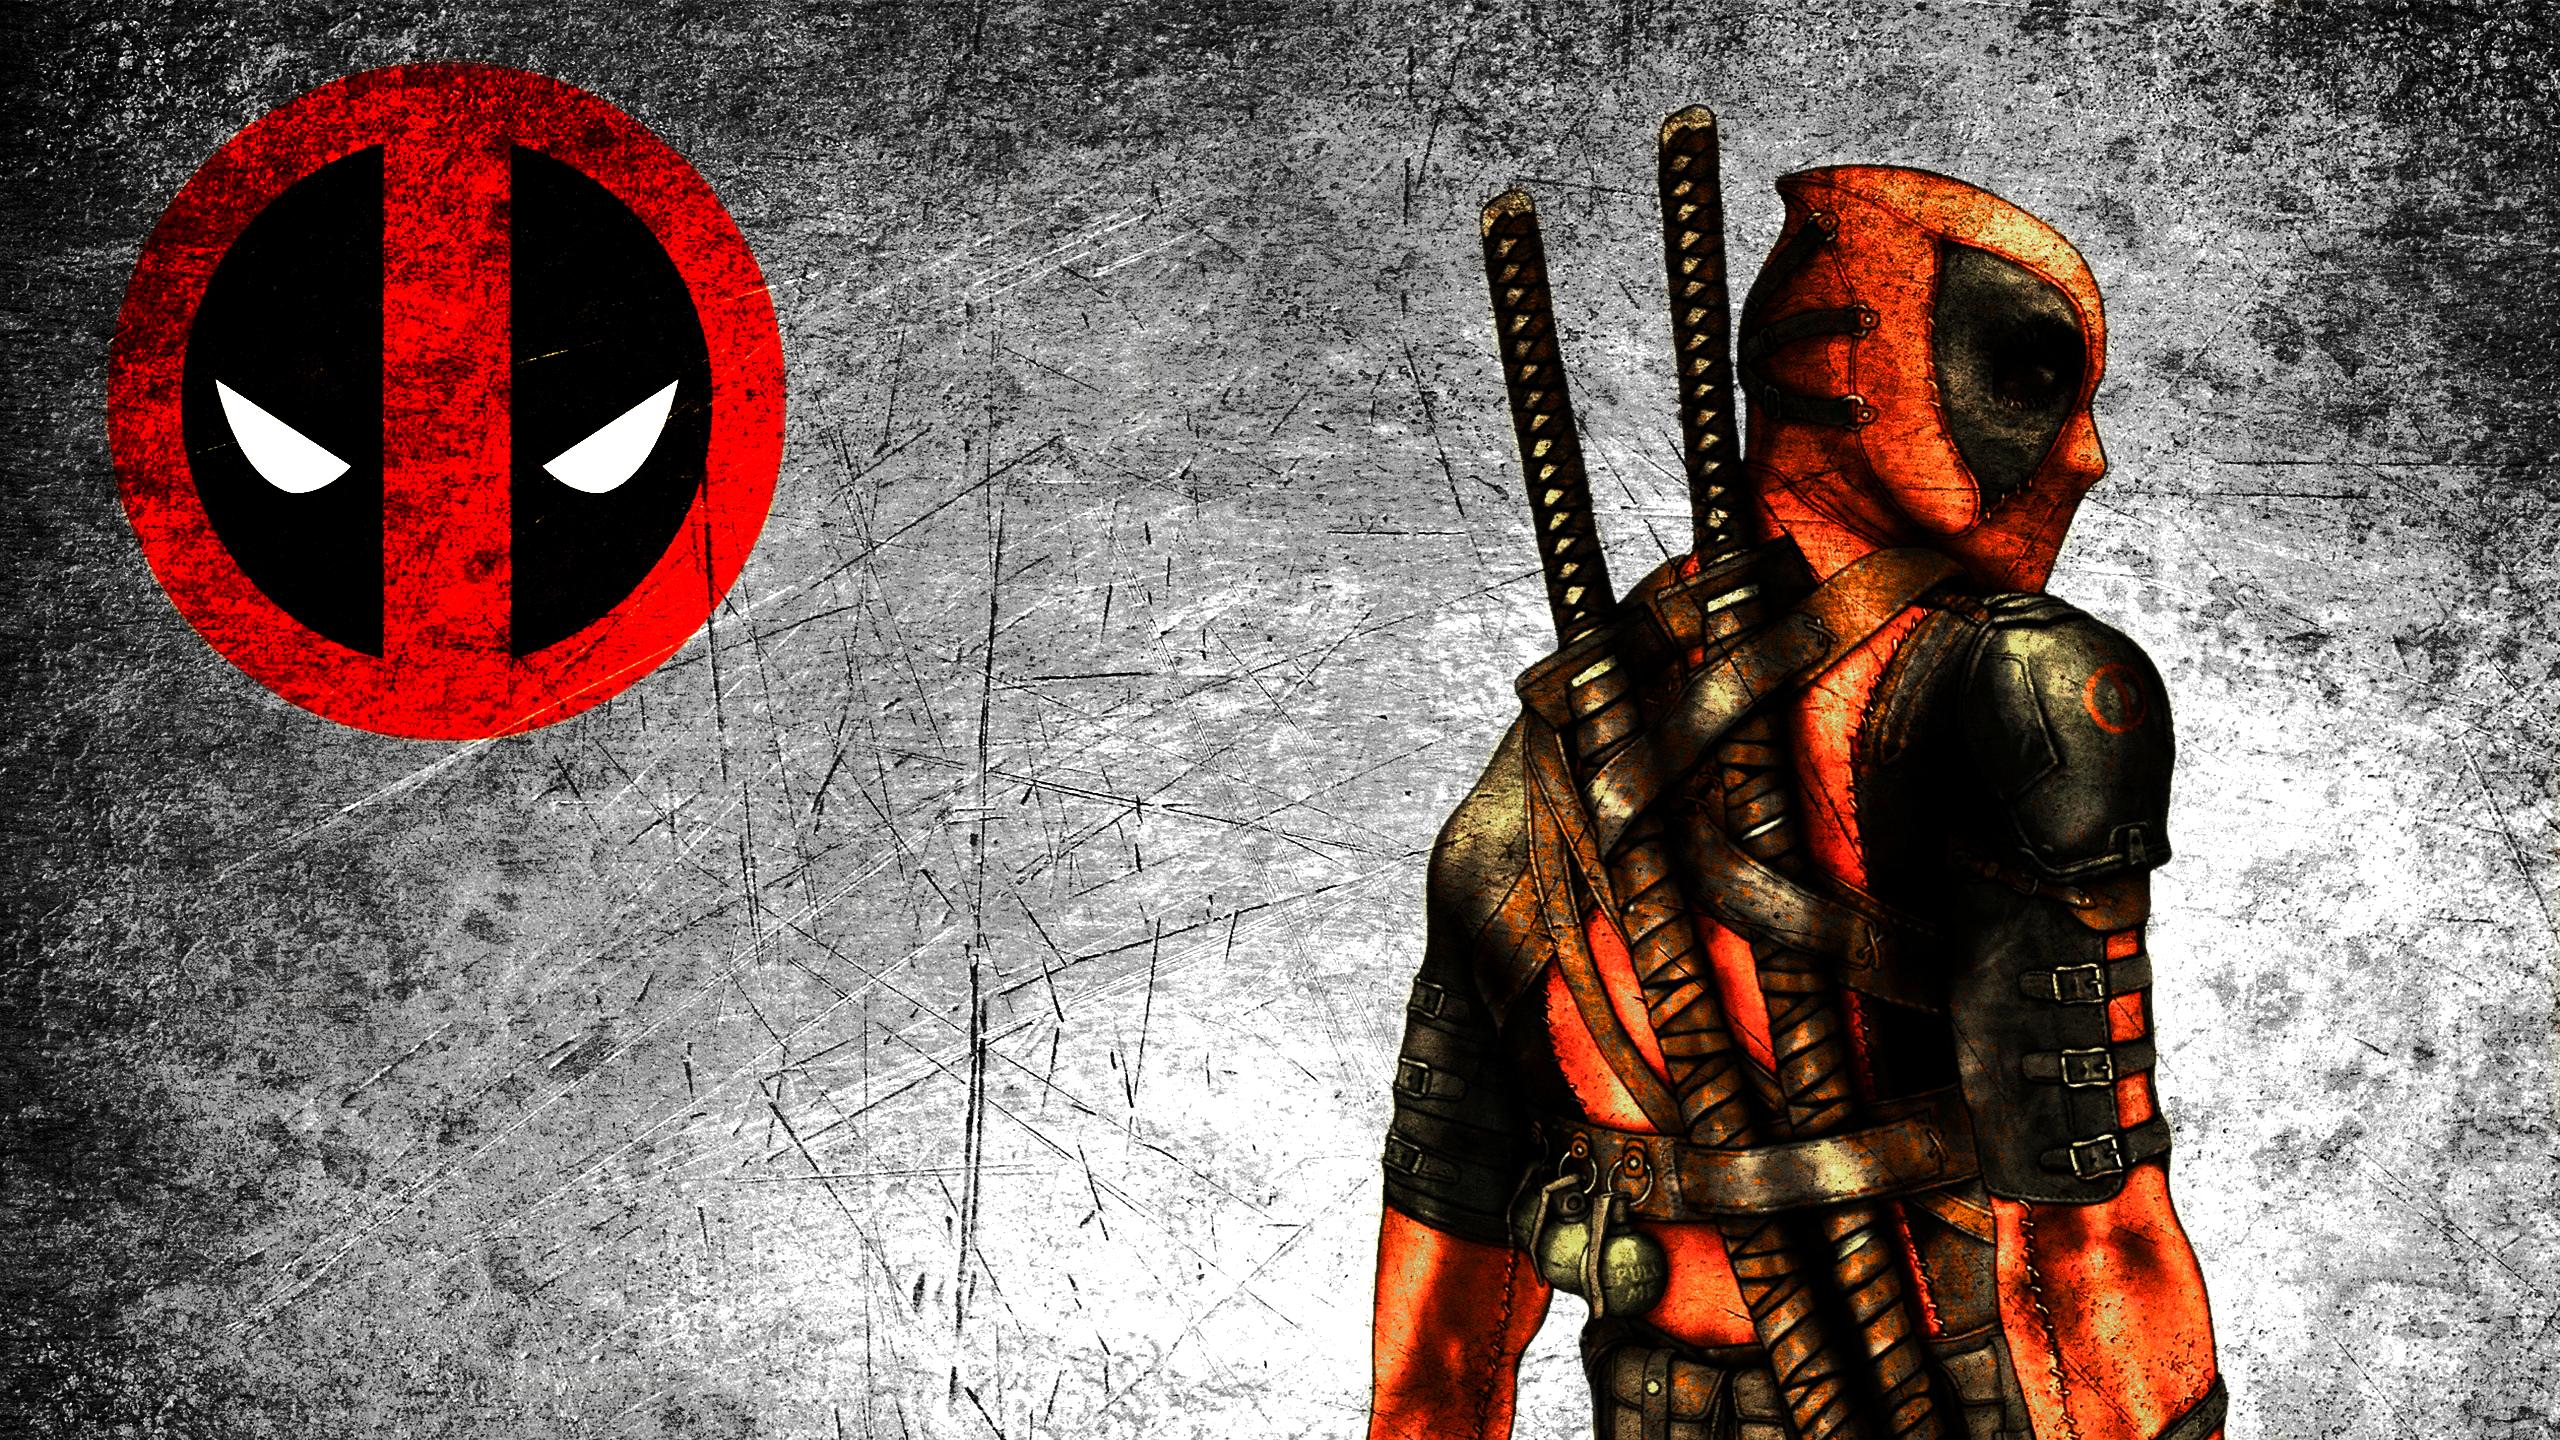 Deadpool HD Wallpaper Full HD Pictures 2560x1440